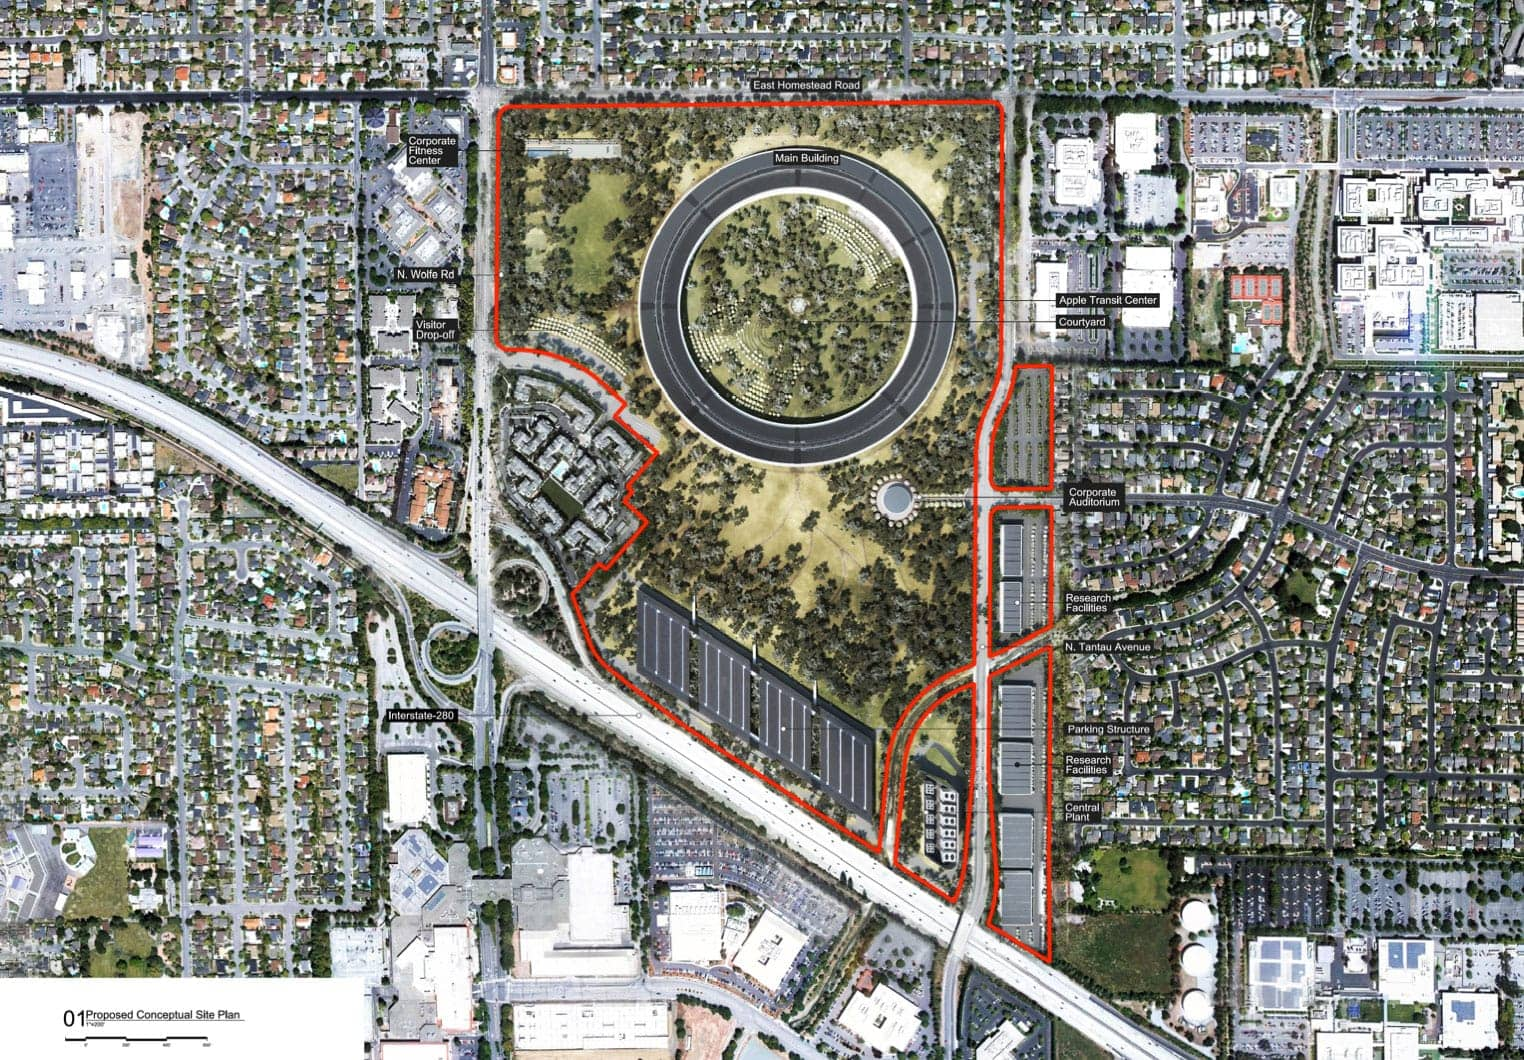 Apple Campus 2 plan